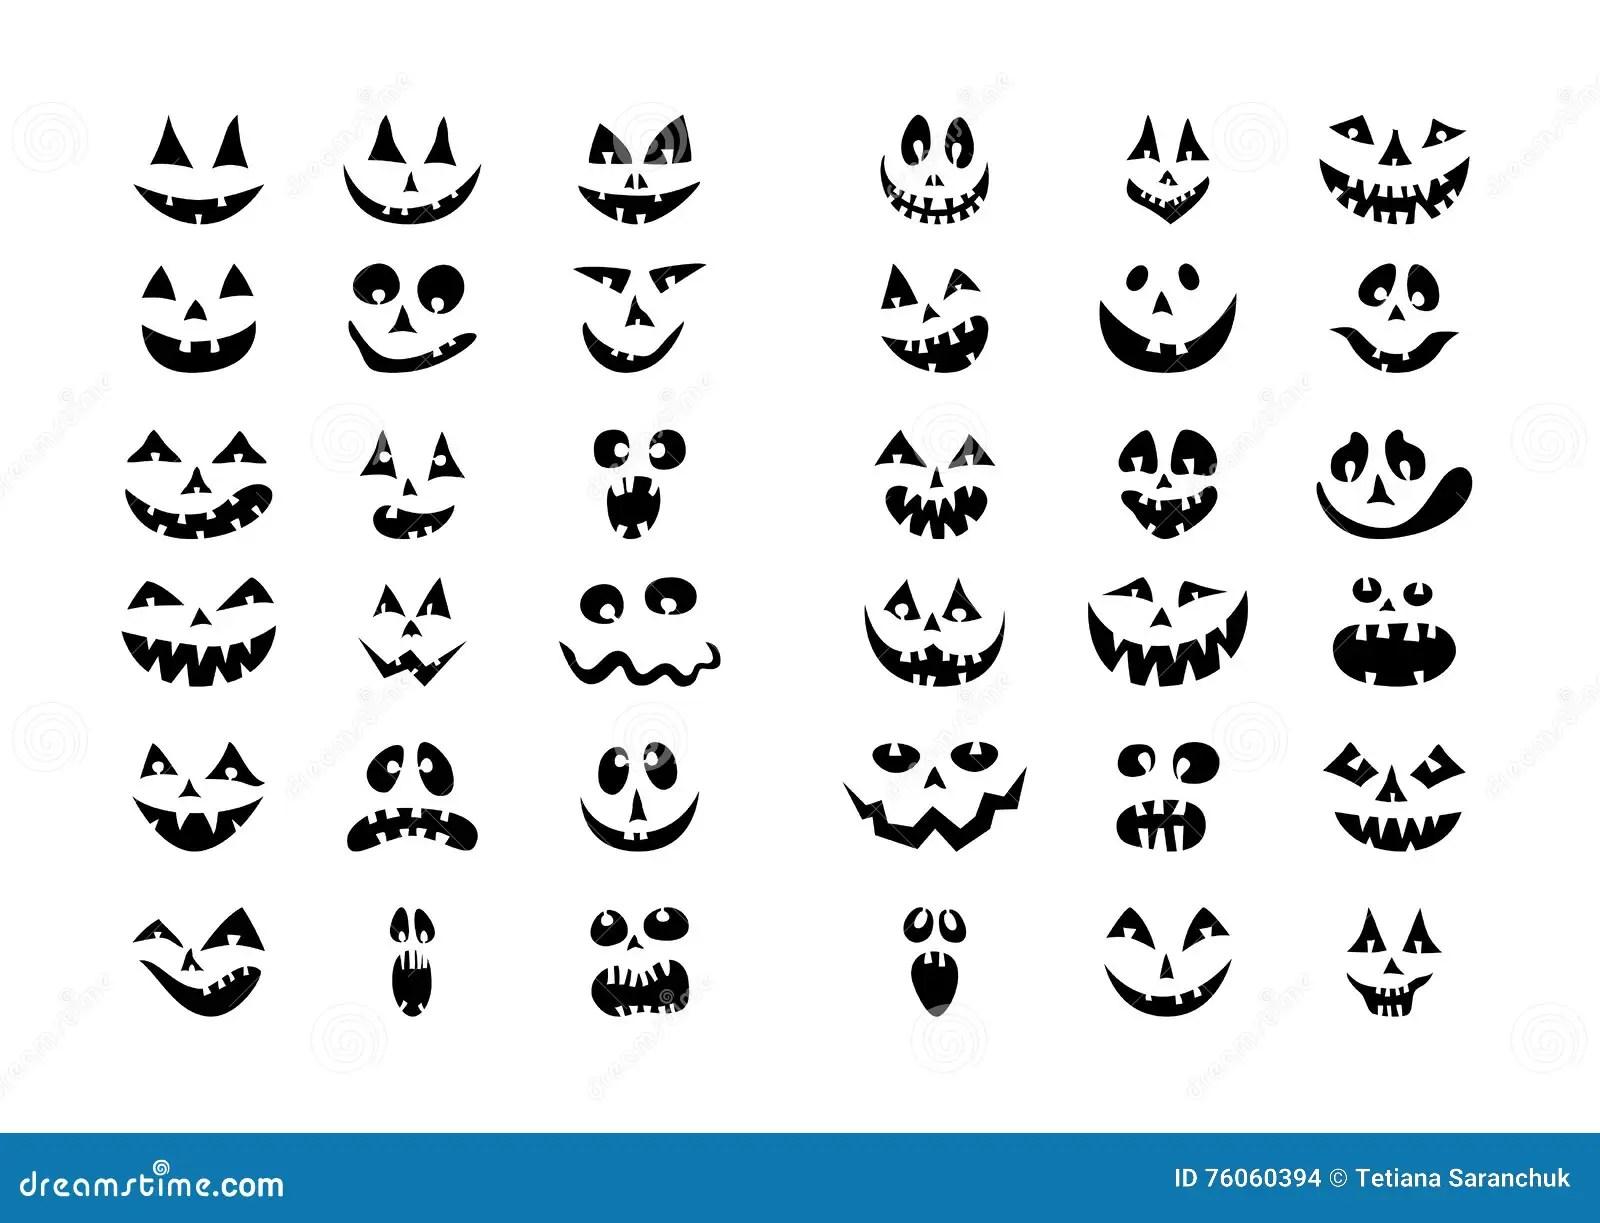 Scary Halloween 36 Pumpkin Faces Icons Set Stock Vector